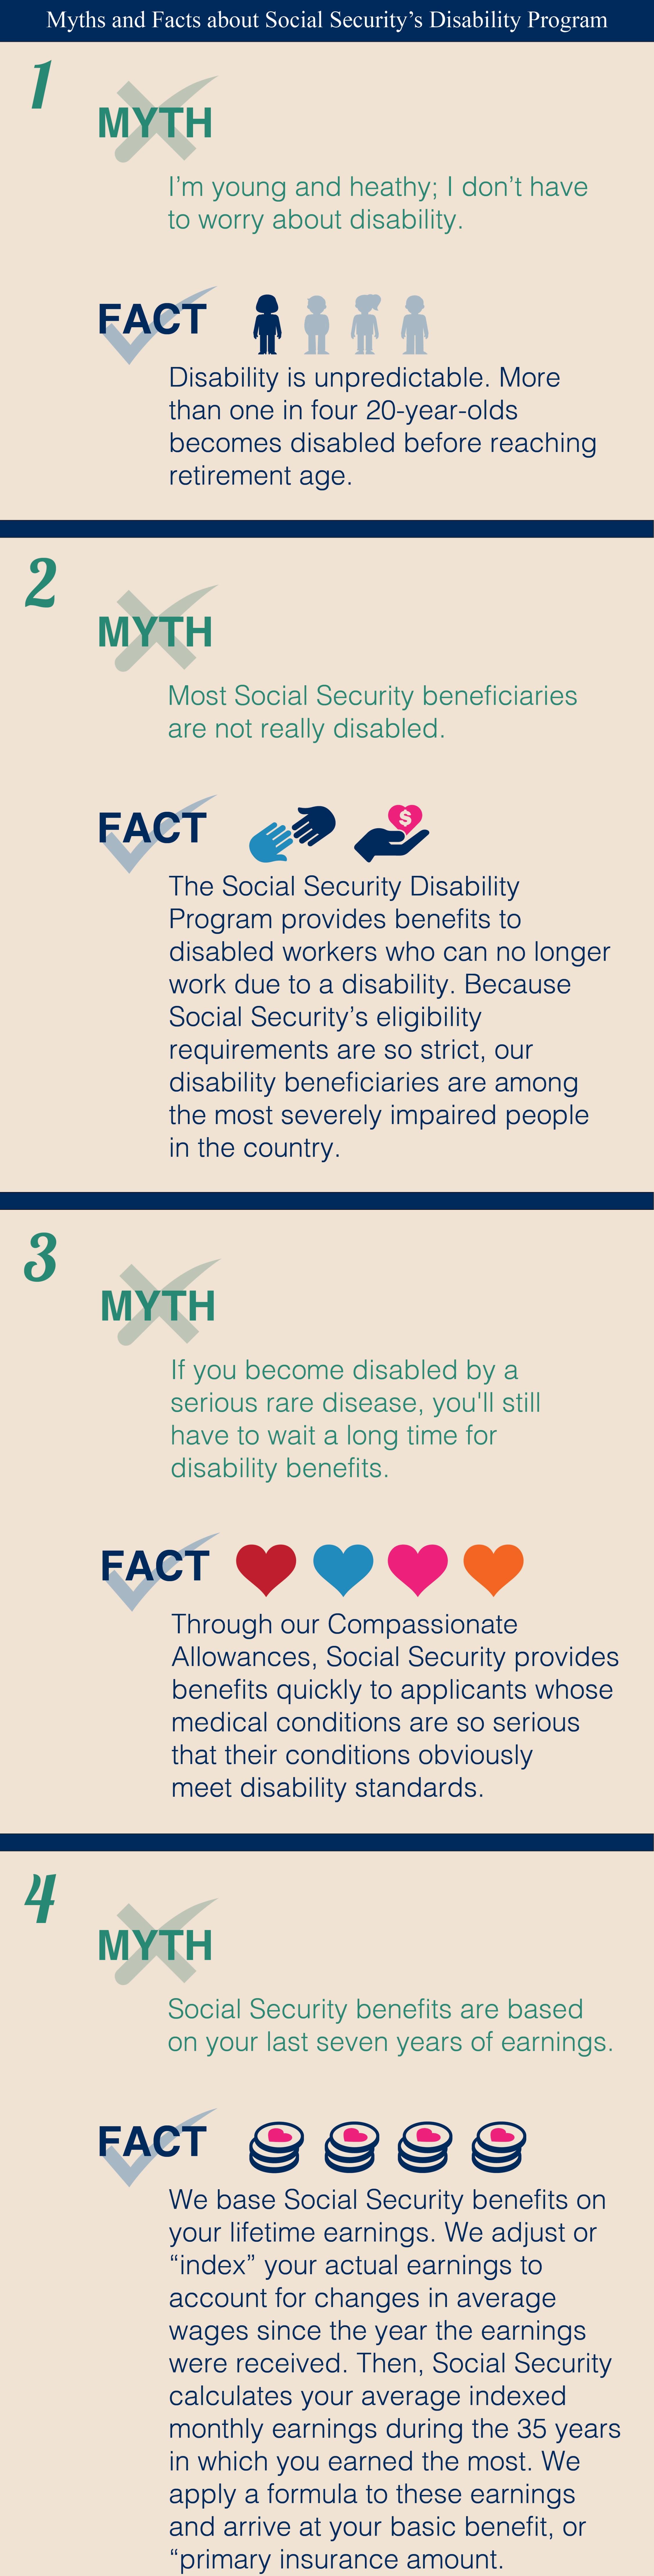 Social Security Matters